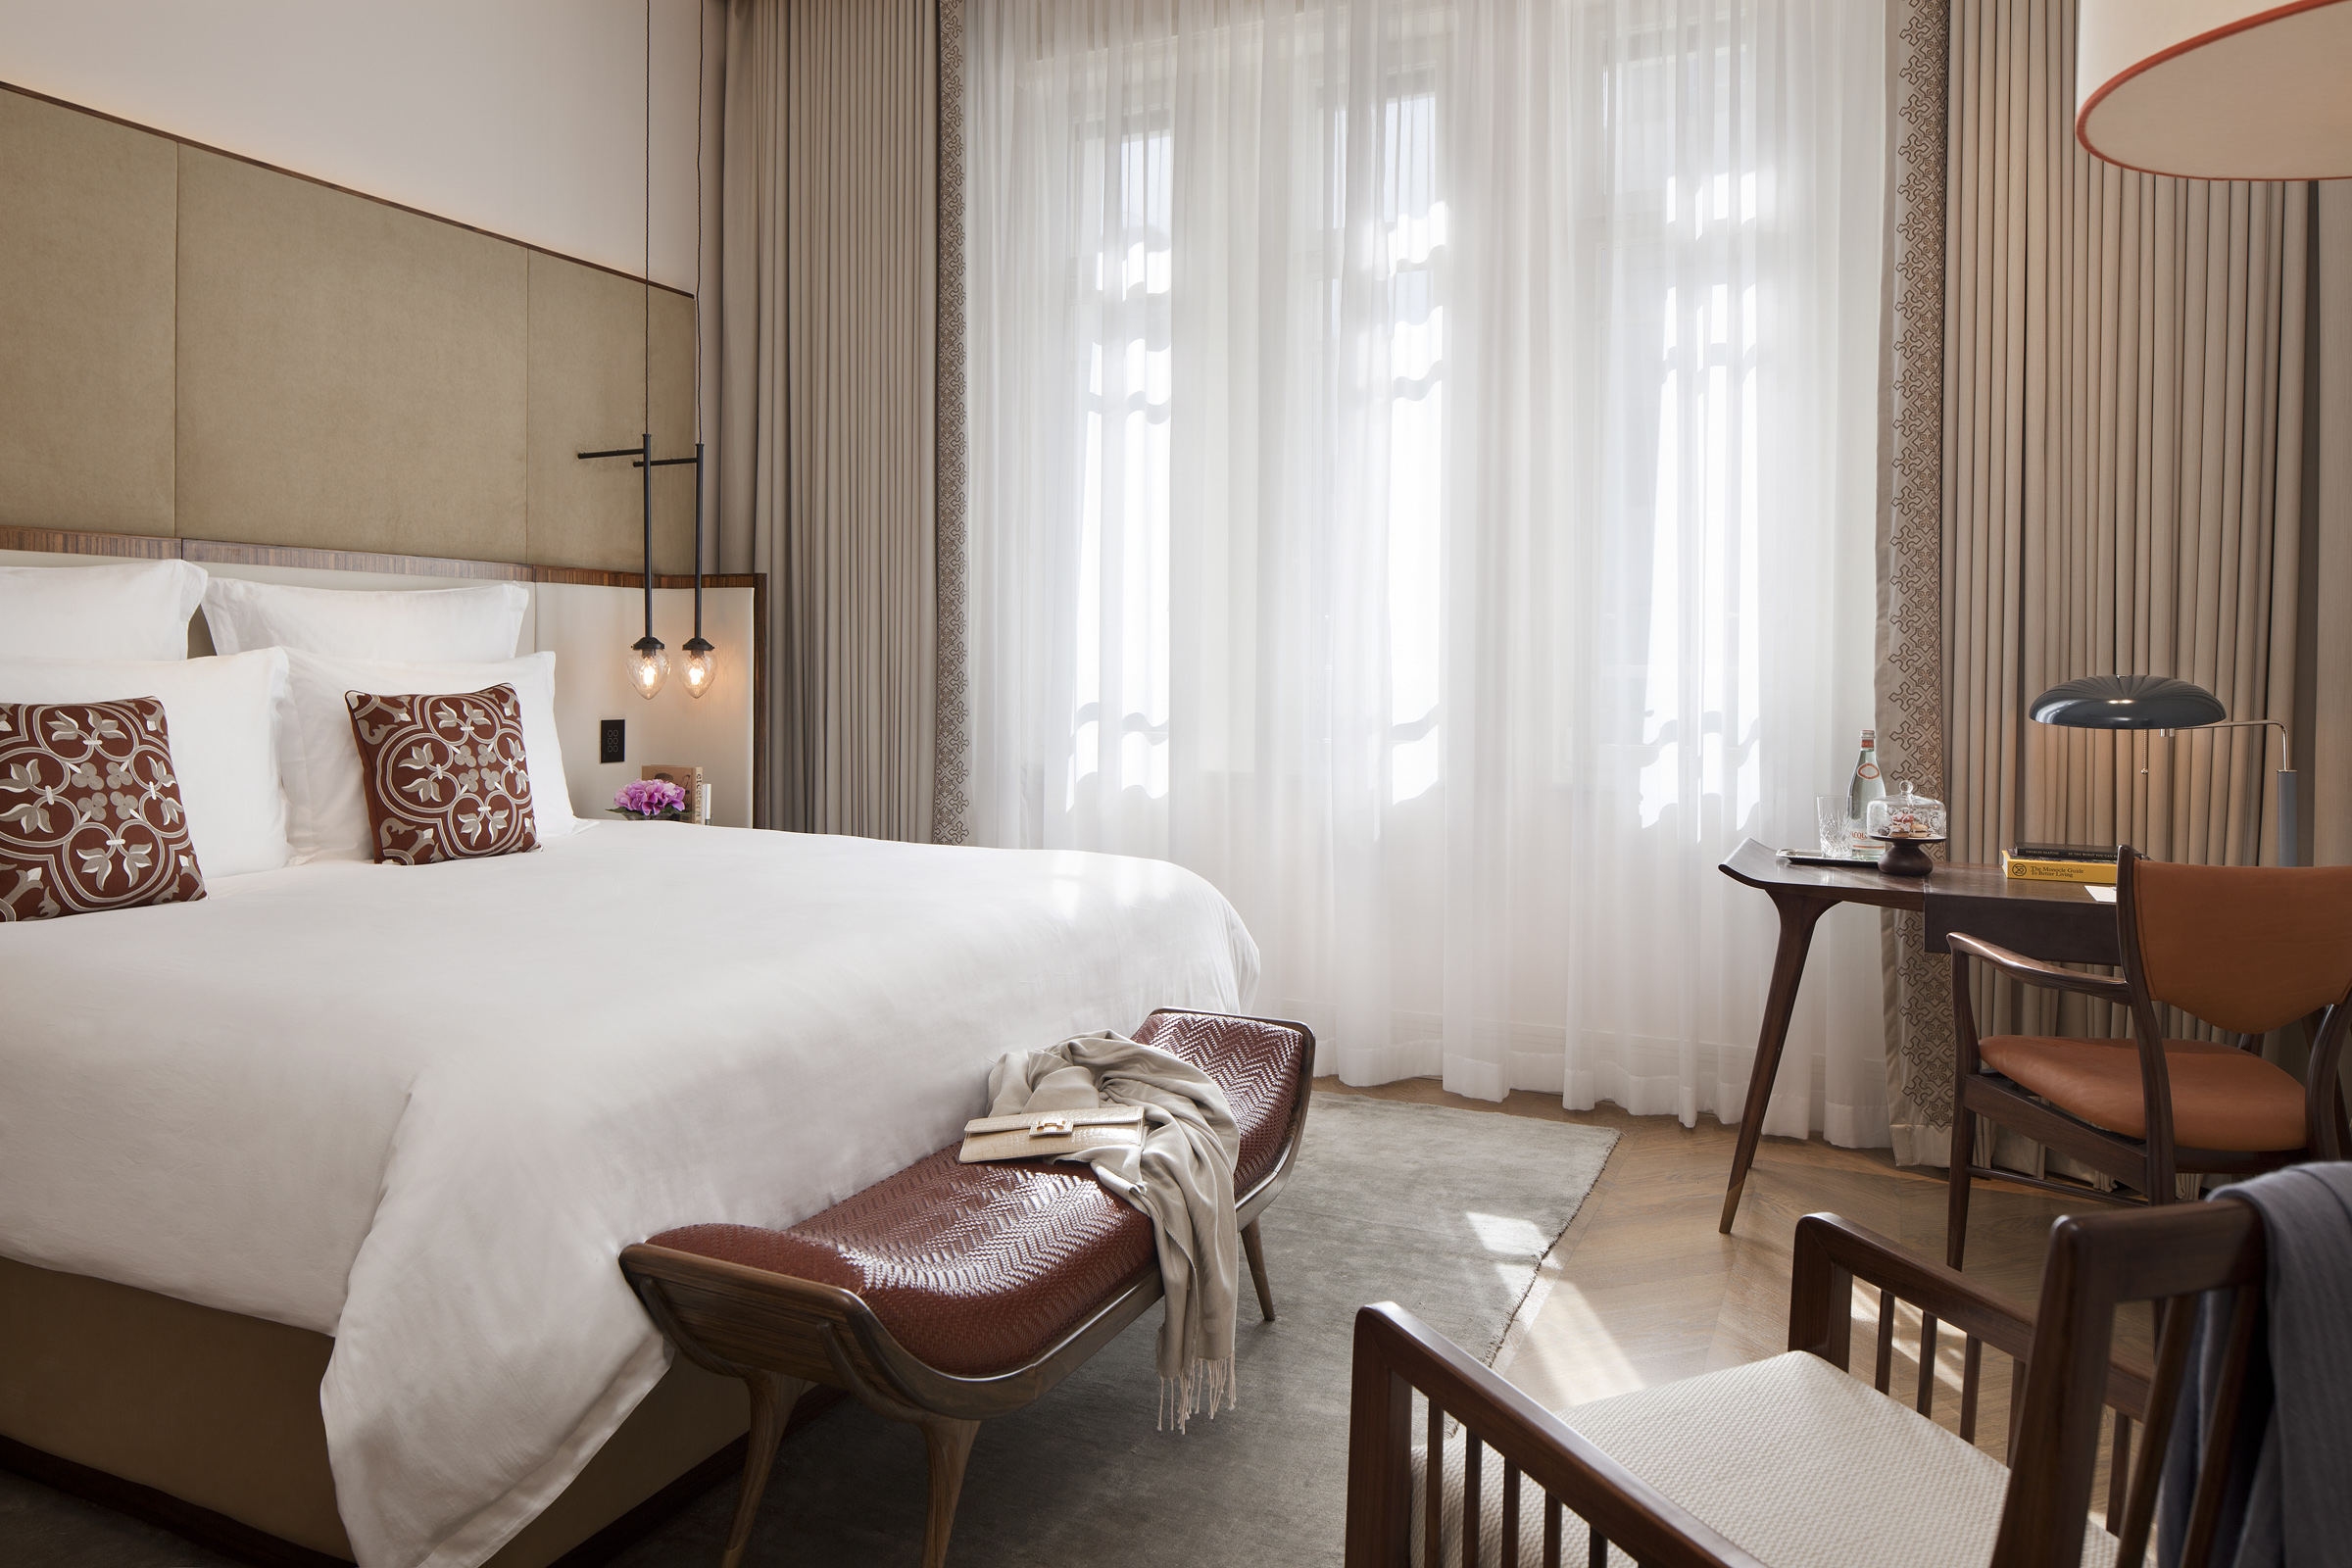 deluxe_norman_hotel_mockup_room_002_-_copy.jpg